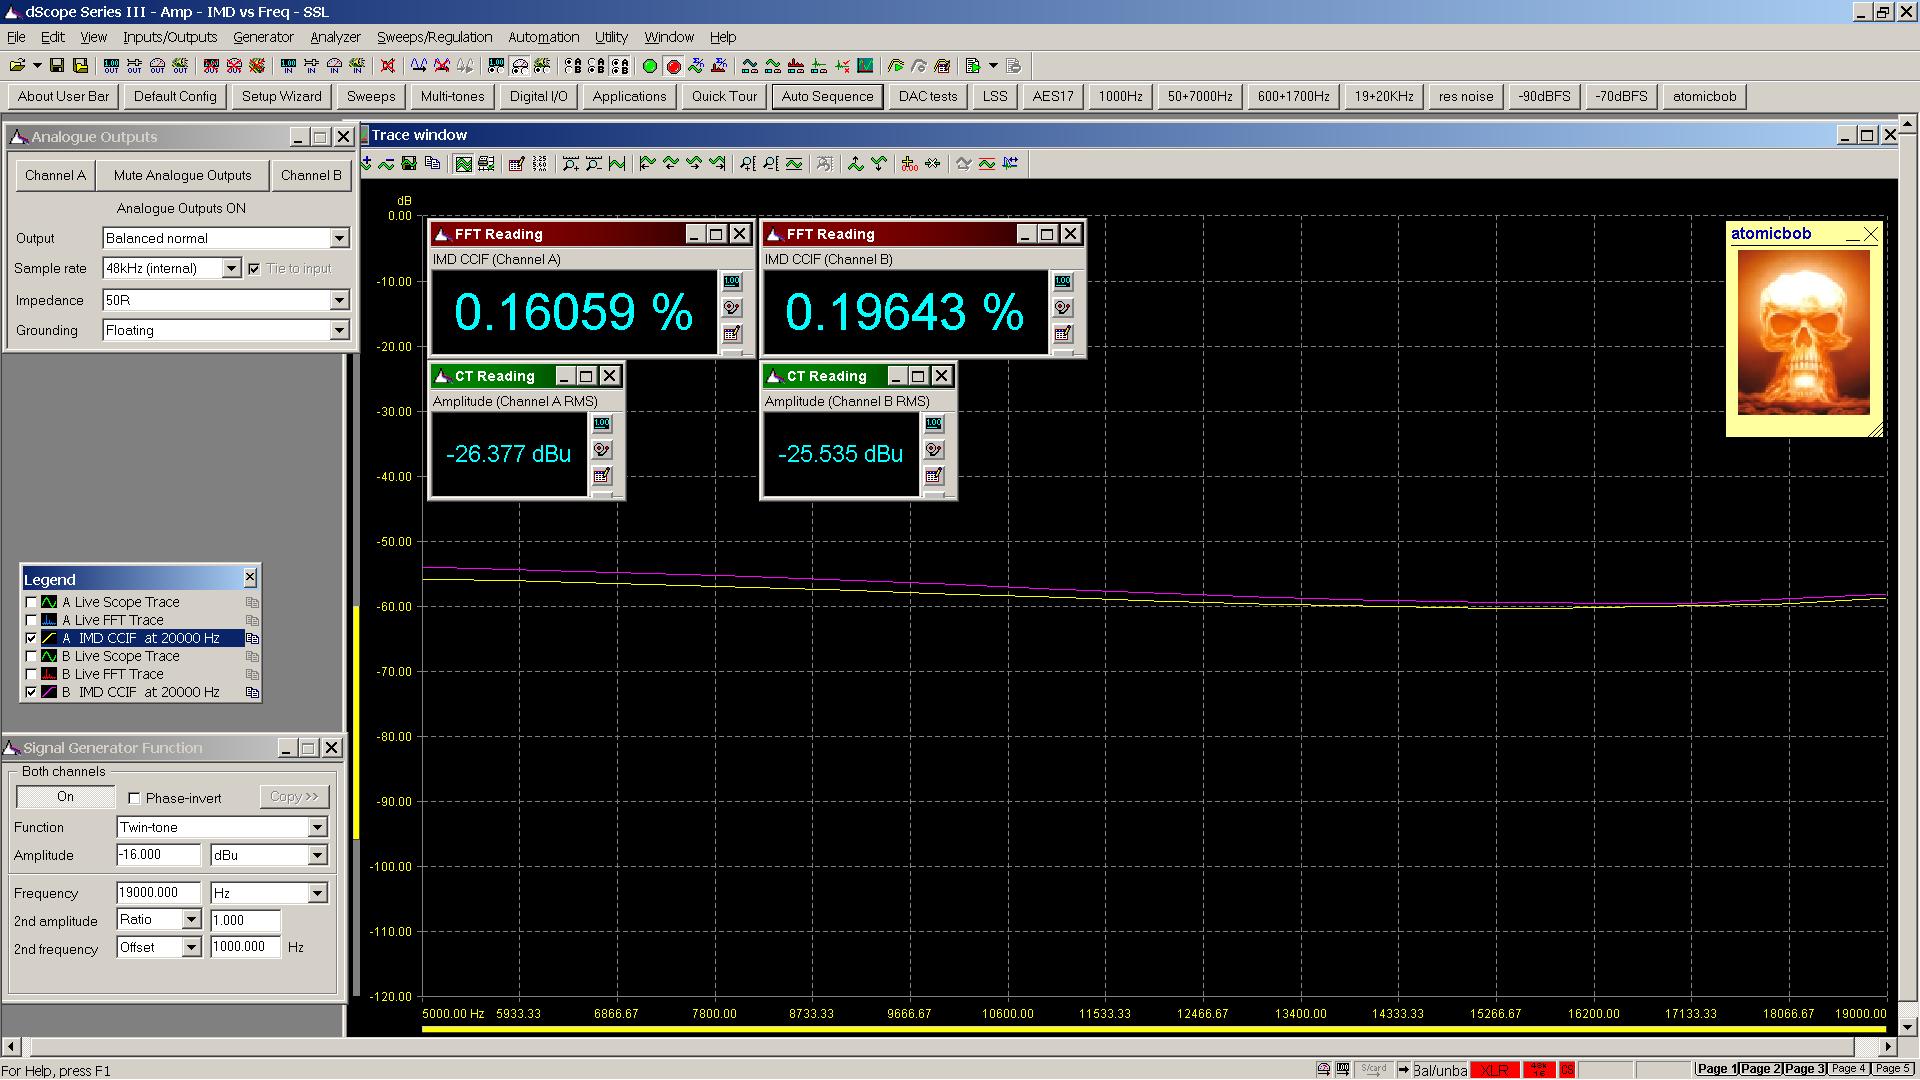 20191007 SW51+ 6Z51P 19+20KHz IMD sweep 20KHz to 5KHz 30R LoZ -10dB gain.png